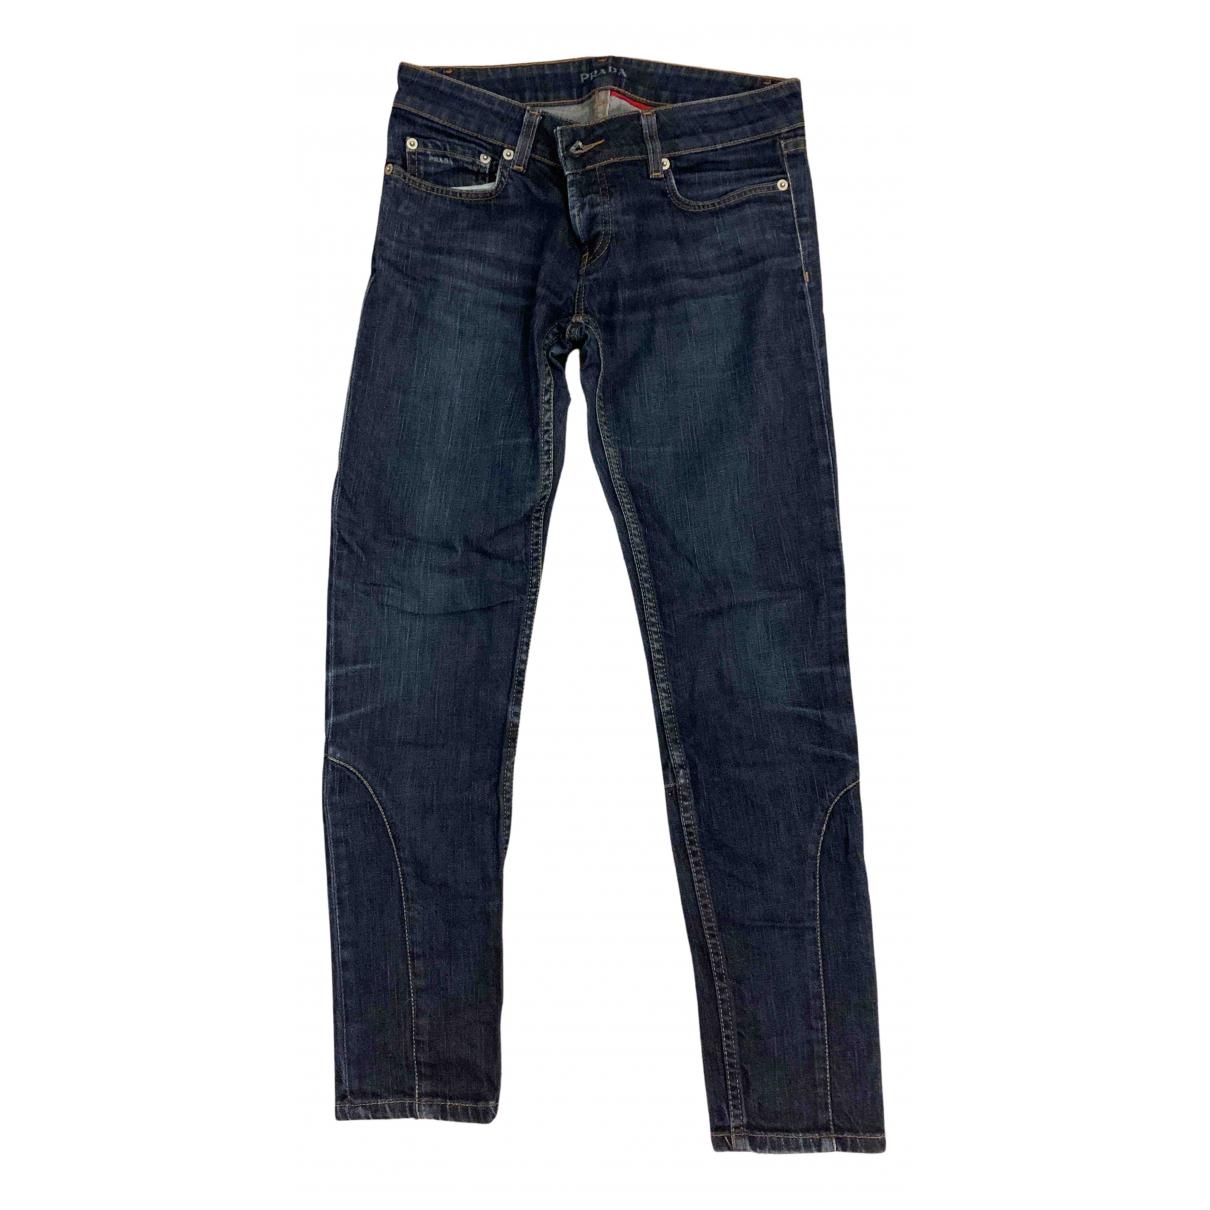 Prada N Blue Denim - Jeans Trousers for Women M International